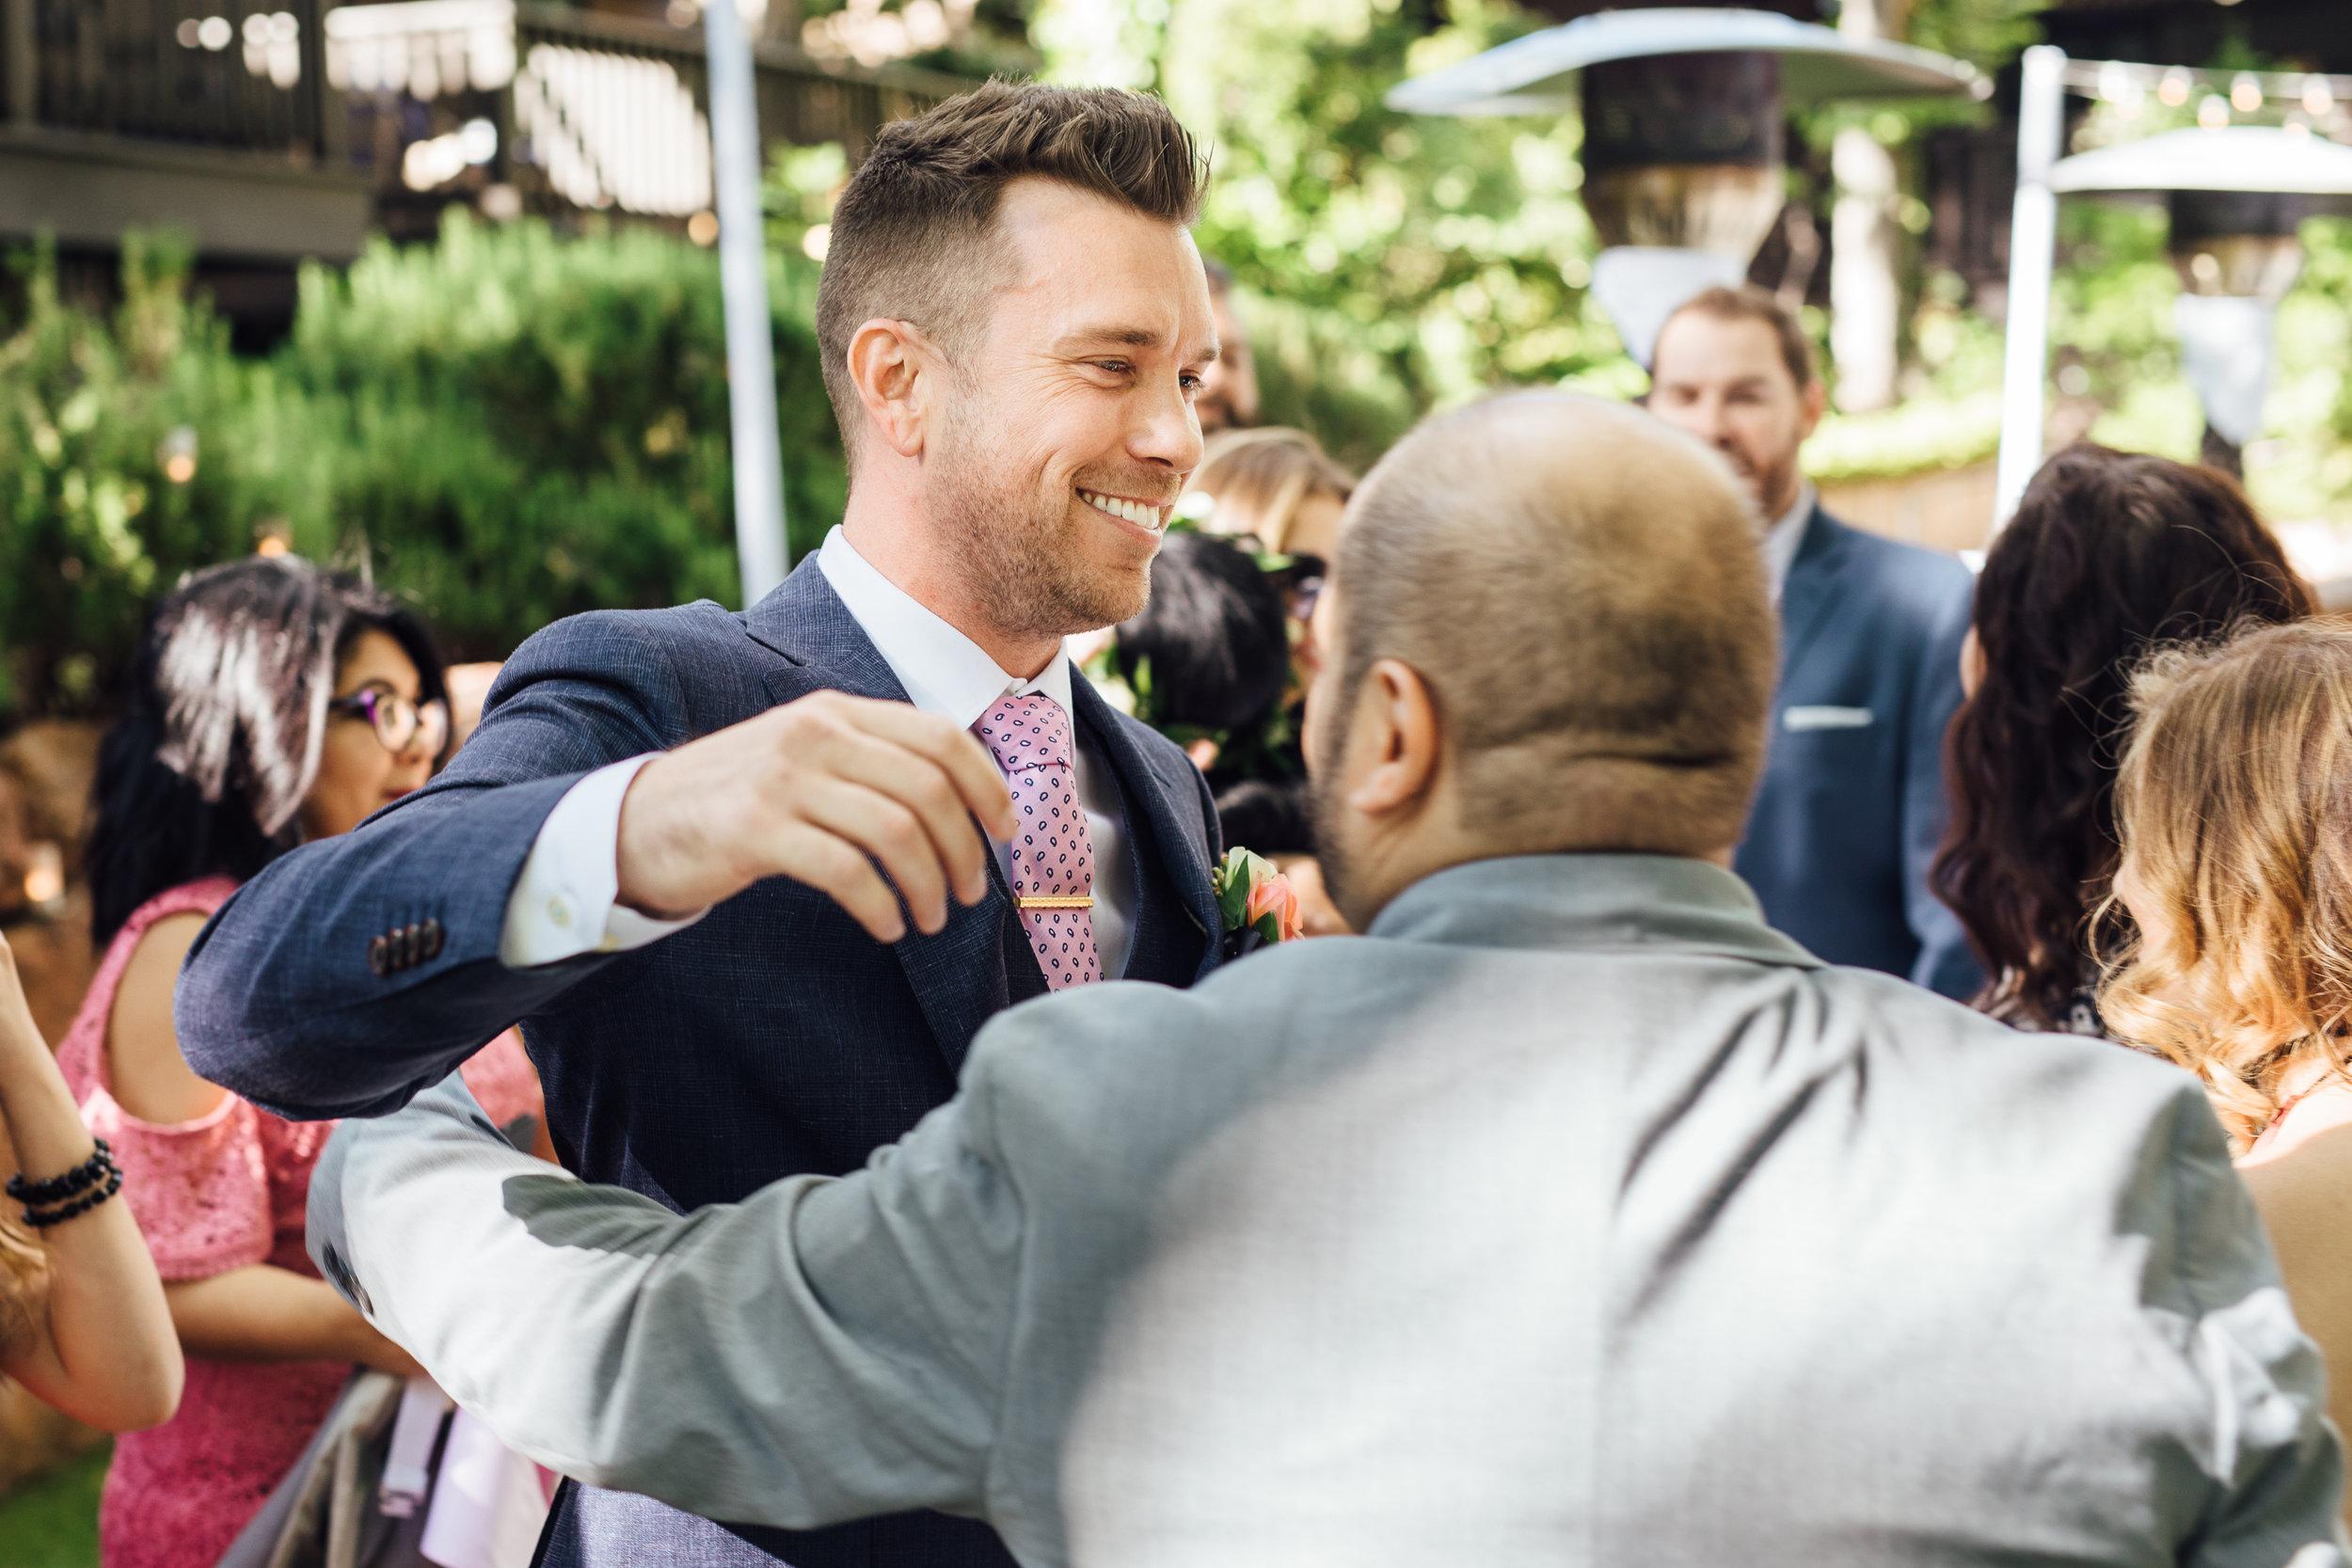 LMW-Sedona-lauberge-wedding-6961.jpg